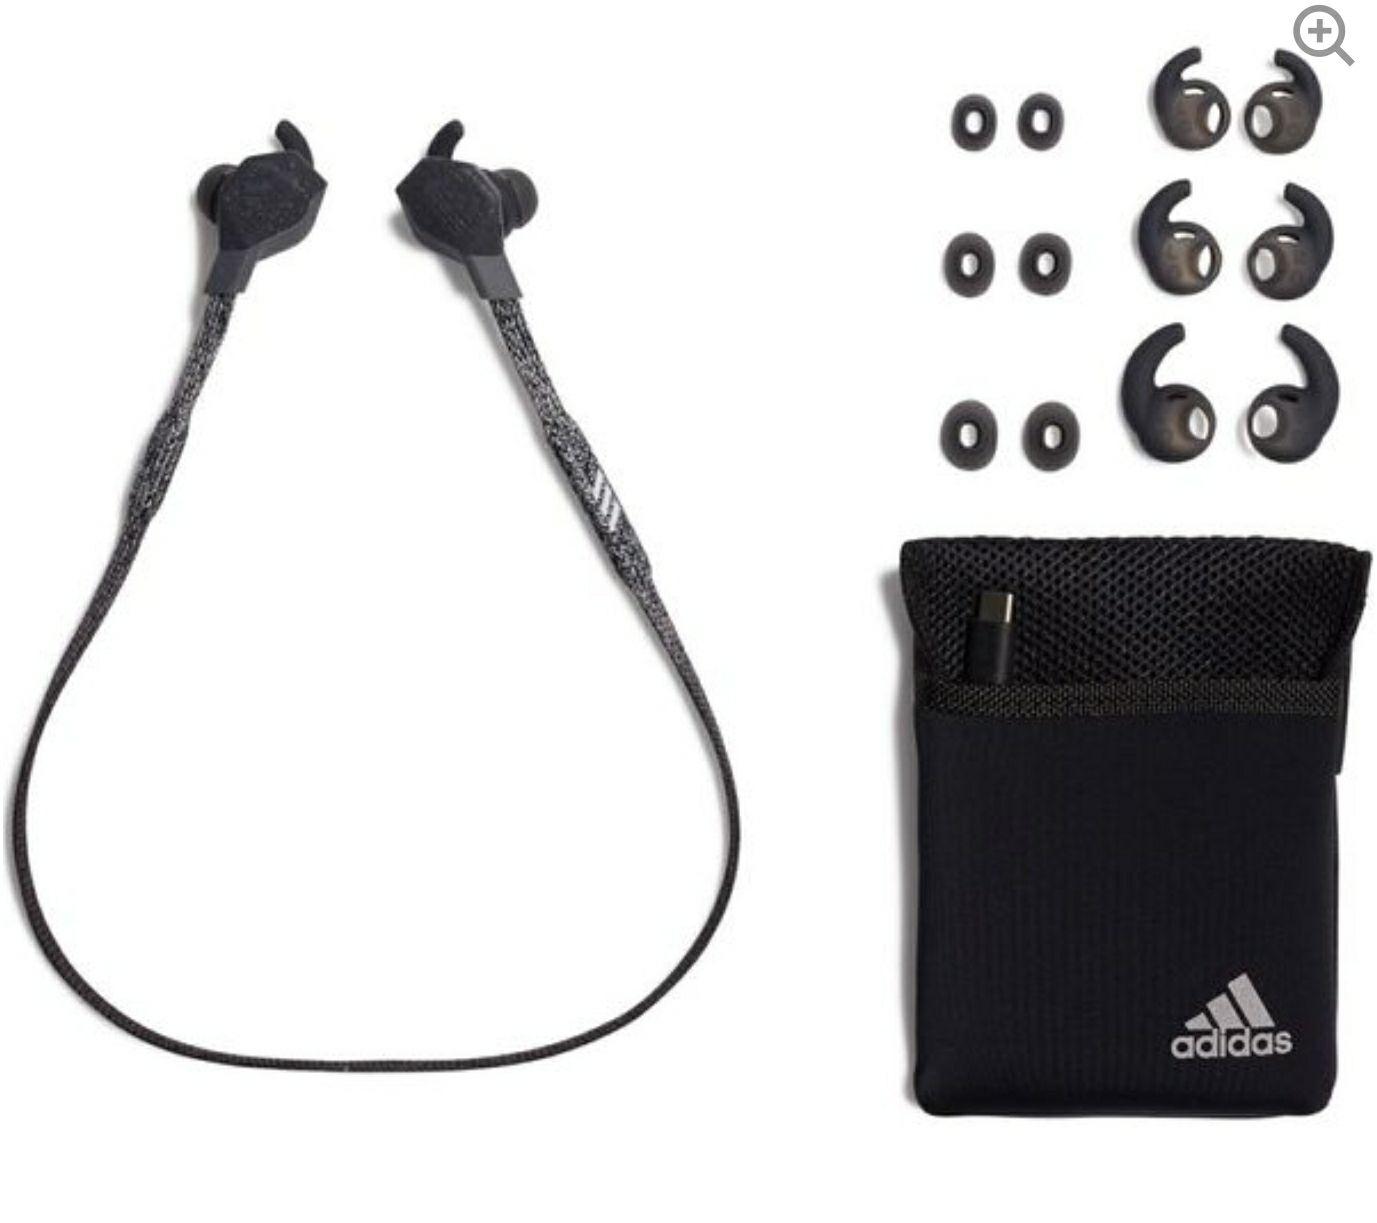 ADIDASFWD-01 Wireless Bluetooth Sports Earphones + 6 months free Spotify Premium & free del @ Currys